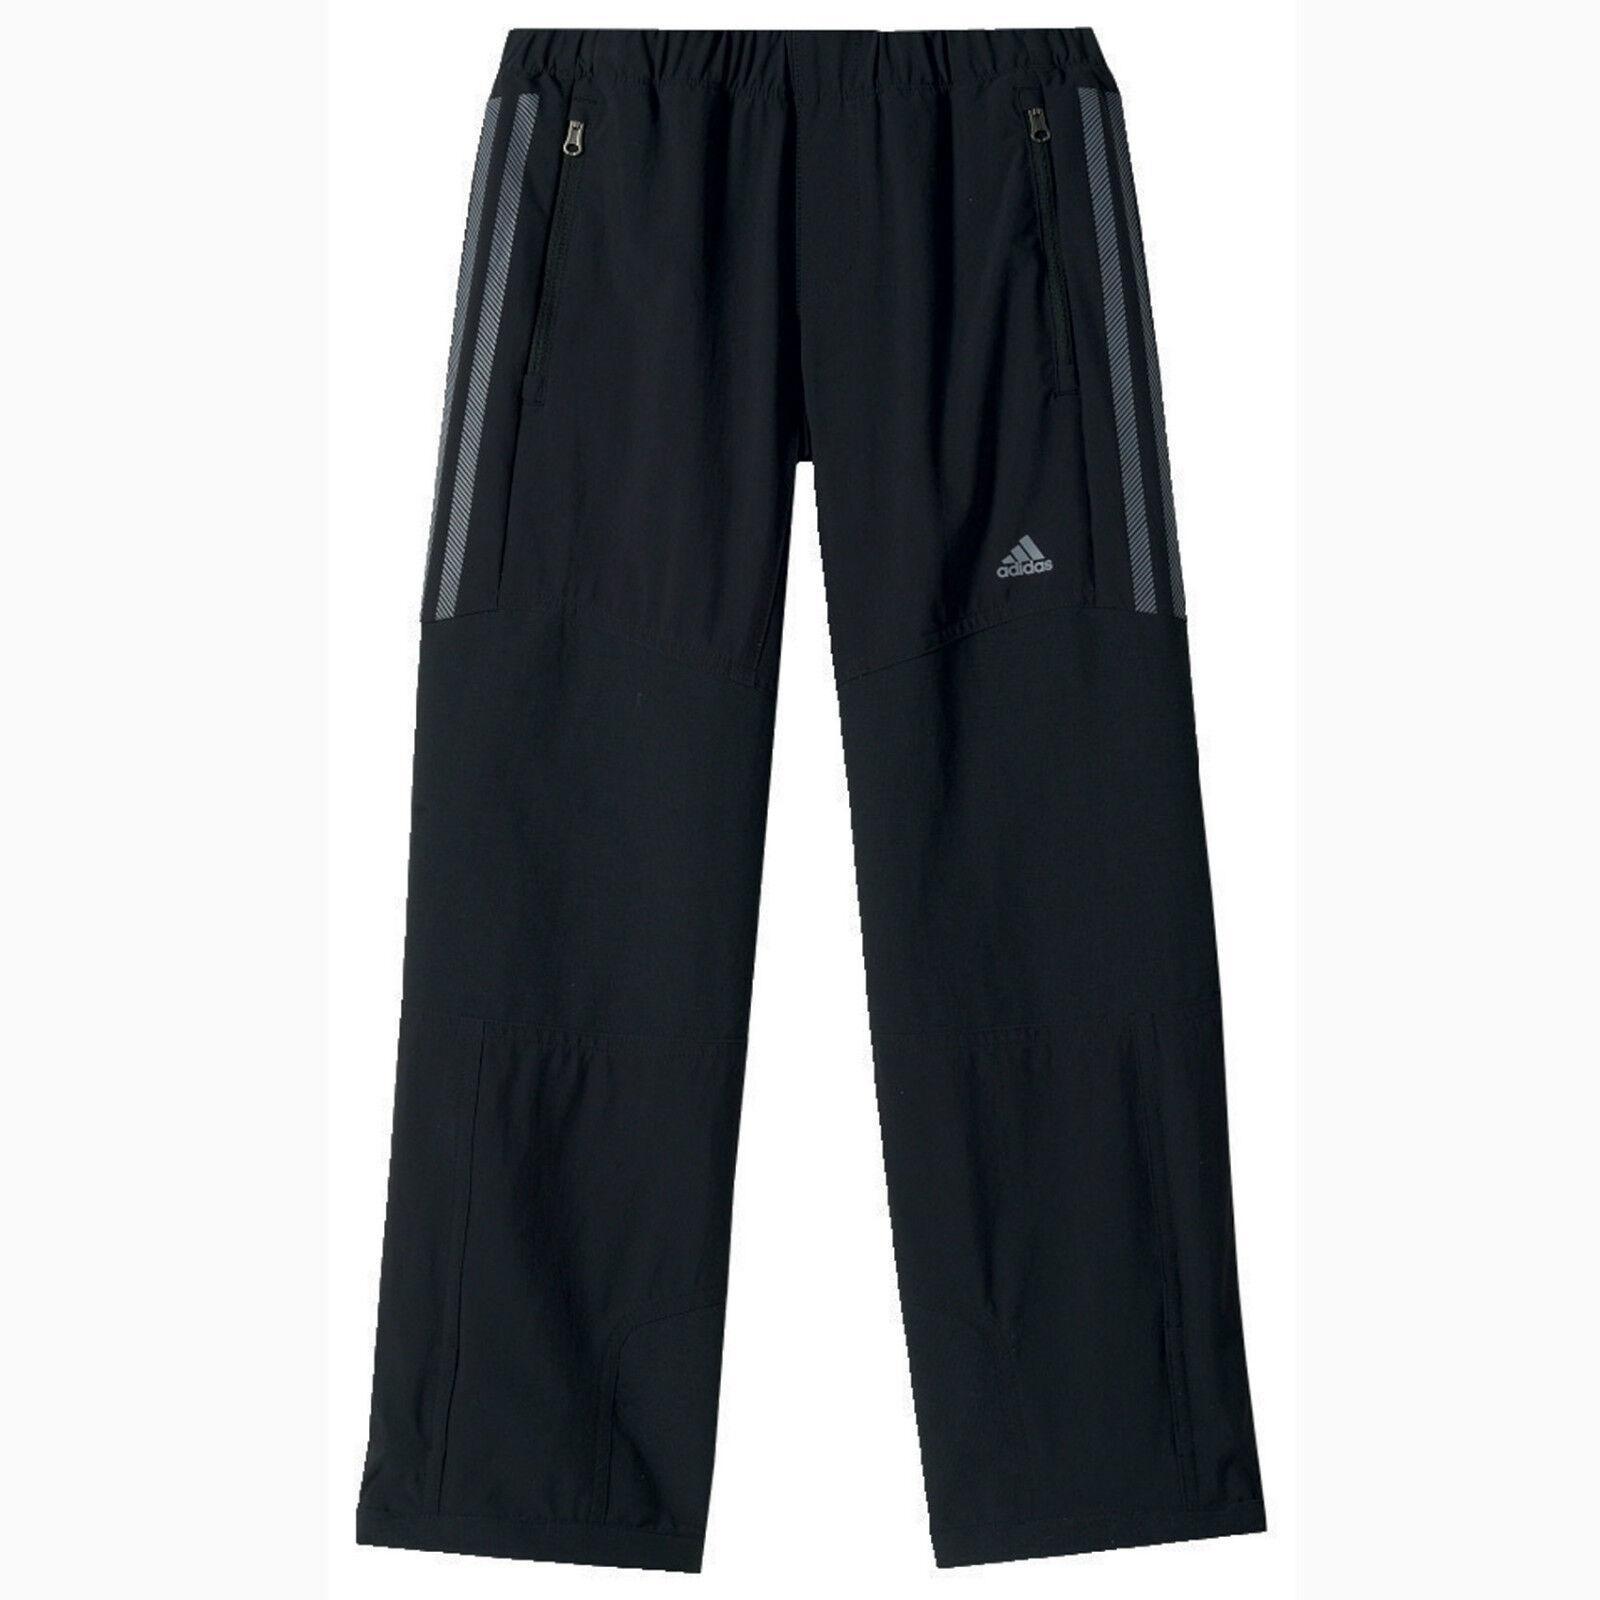 Adidas Multi Pants Boys Girls Wanderhose Trekkinghose stretch, wasserabweisend